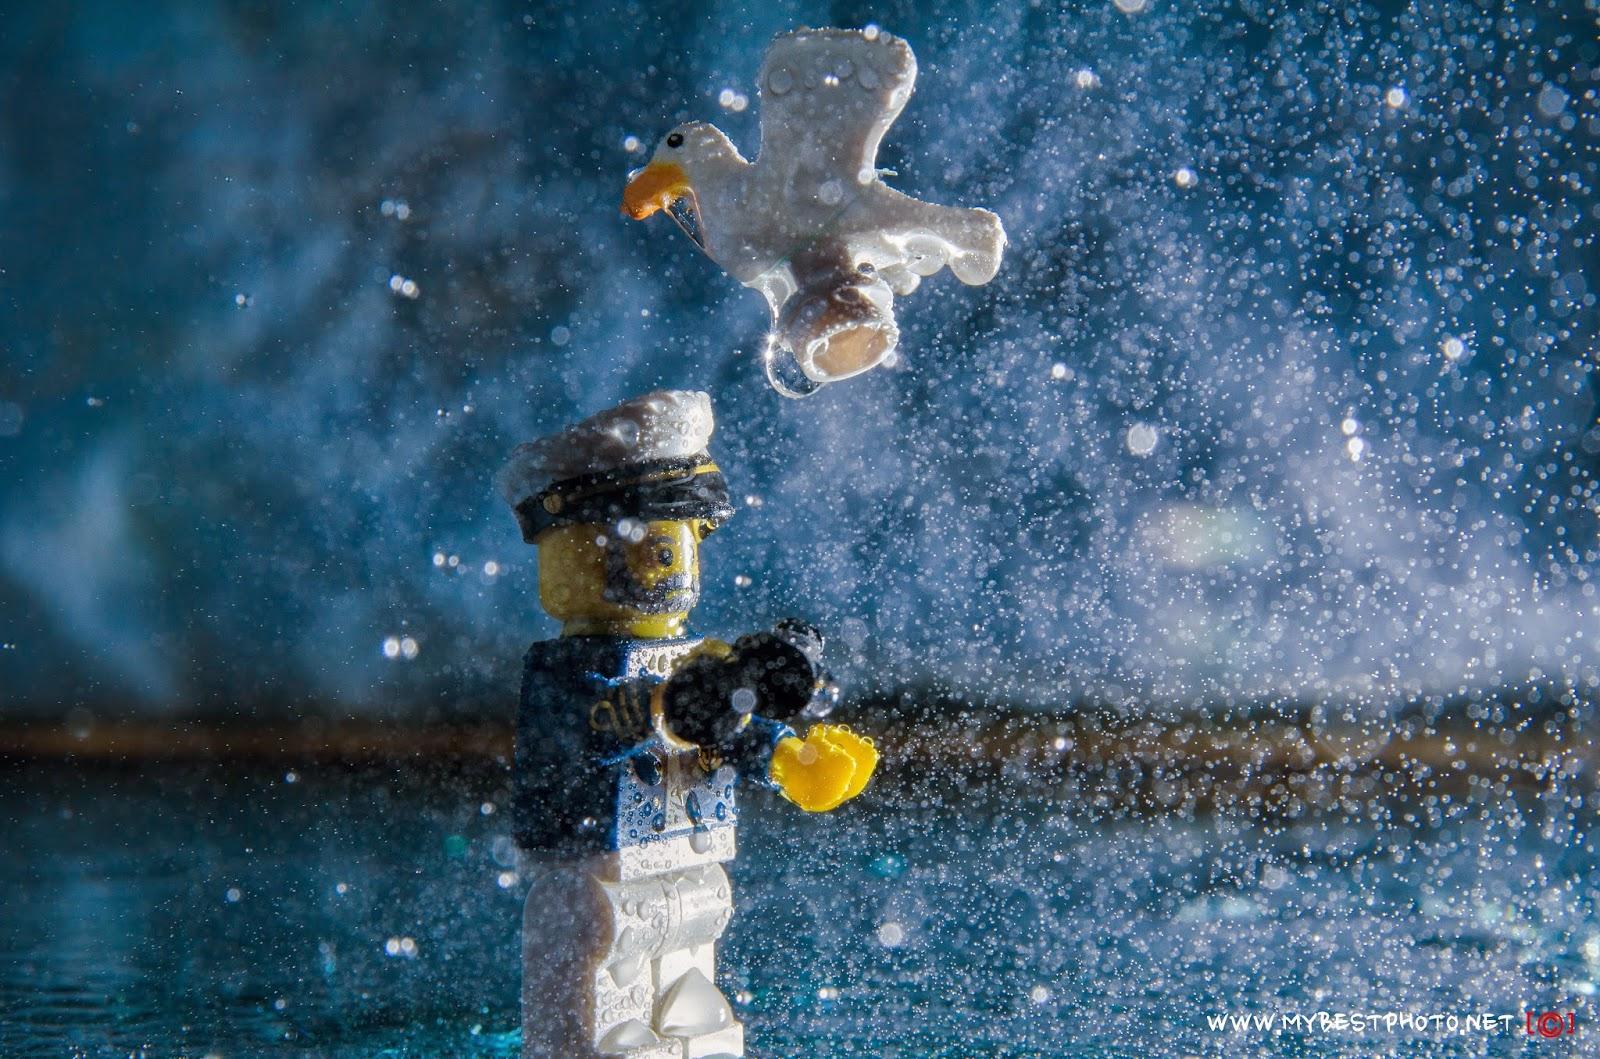 Lego Minifigure Series 10 Sea Captain - Wallpaper